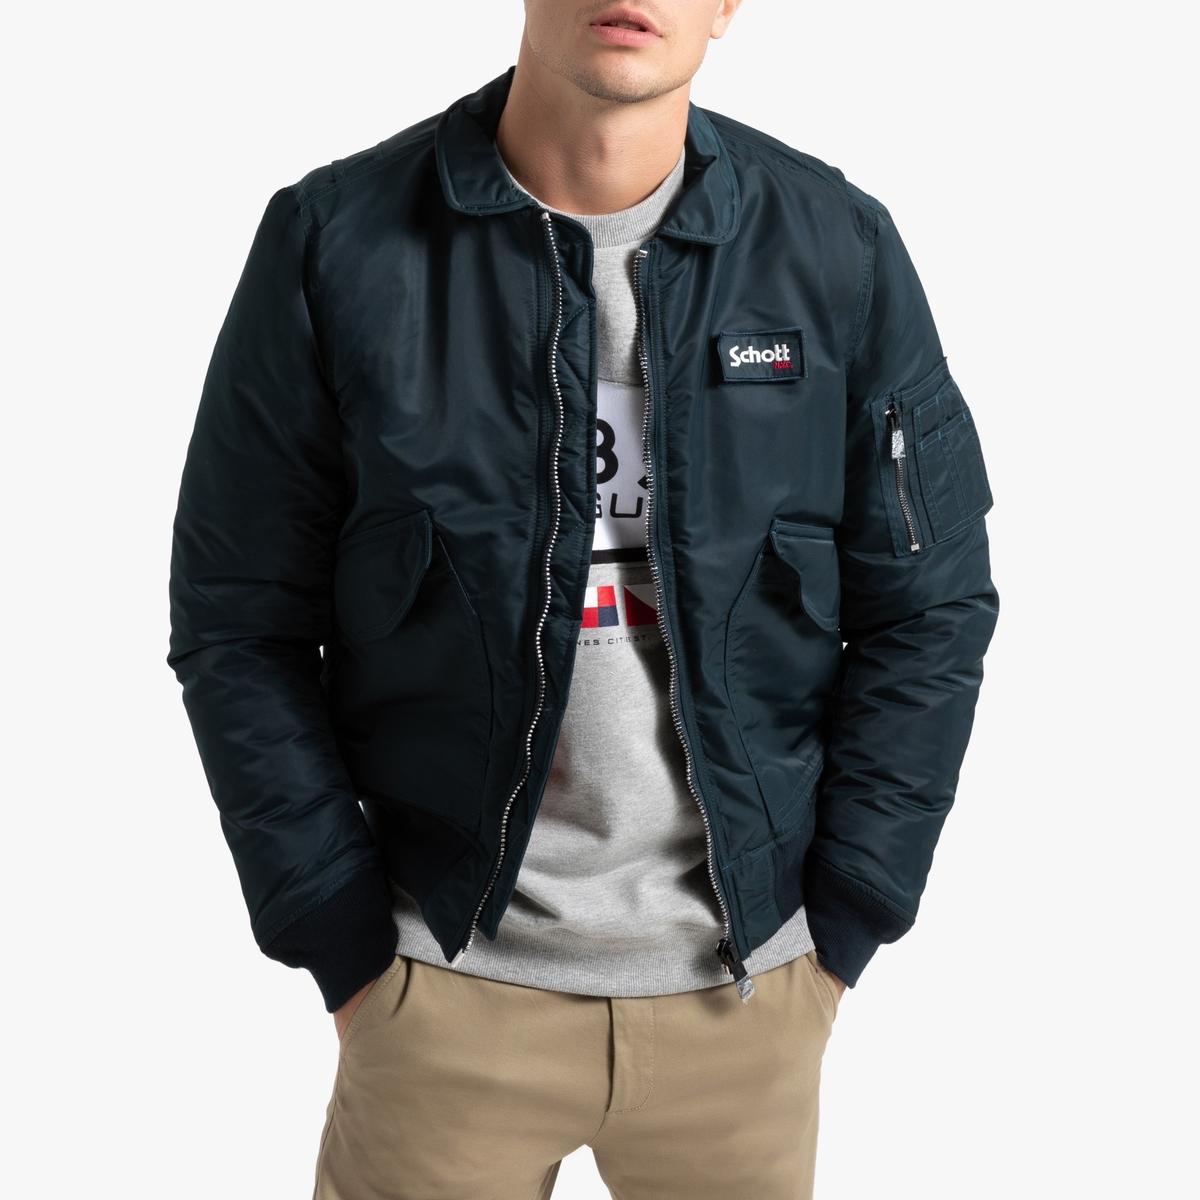 Куртка-бомбер La Redoute La Redoute XL синий шорты la redoute la redoute m синий